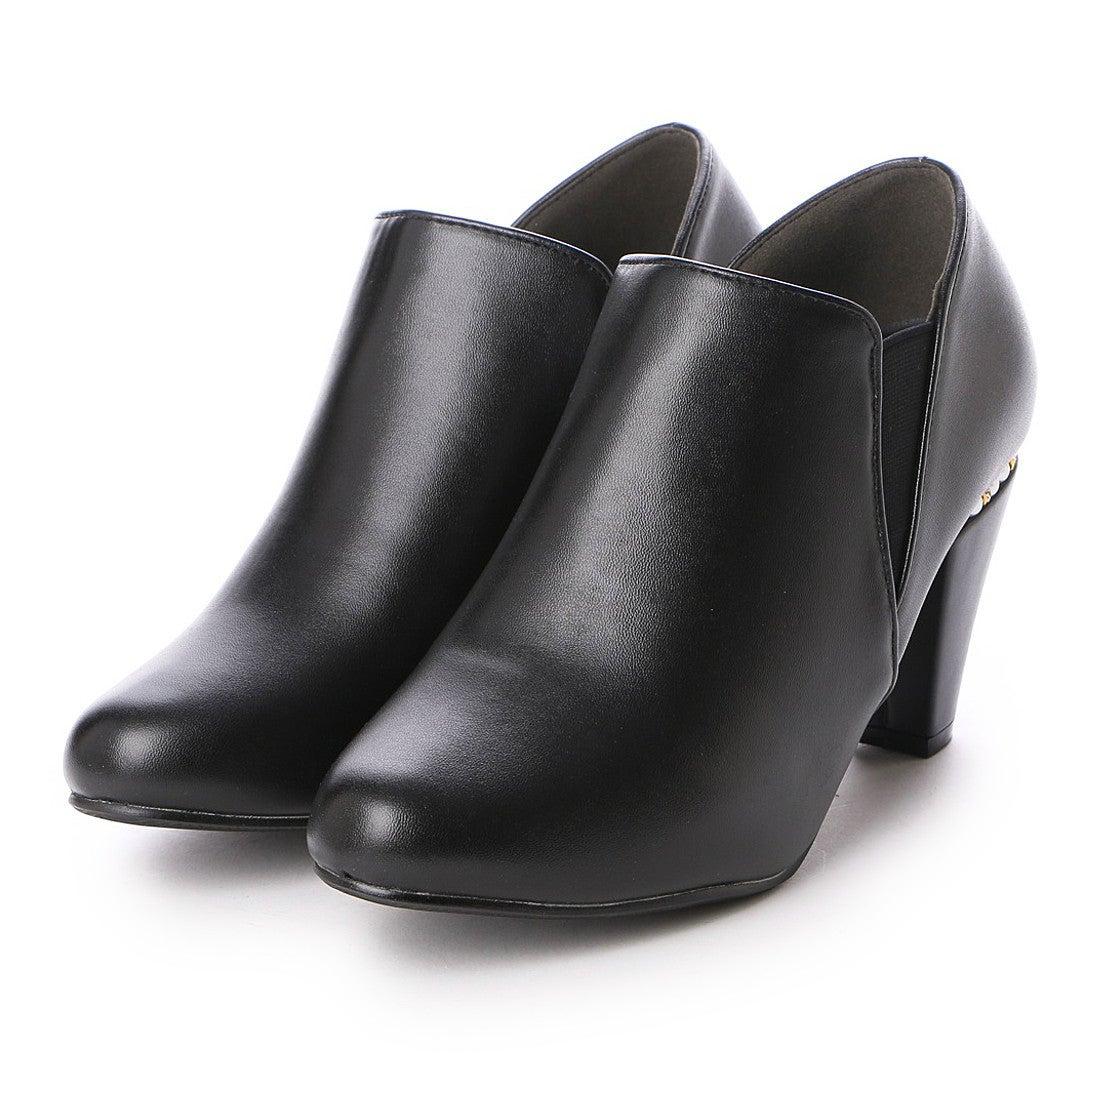 【SALE 50%OFF】ヌーベルヴォーグ リラックス NOUBEL VOUG Relax パール付き ハイヒール サイドゴア ブーティー ショート ブーツ (ブラック) レディース